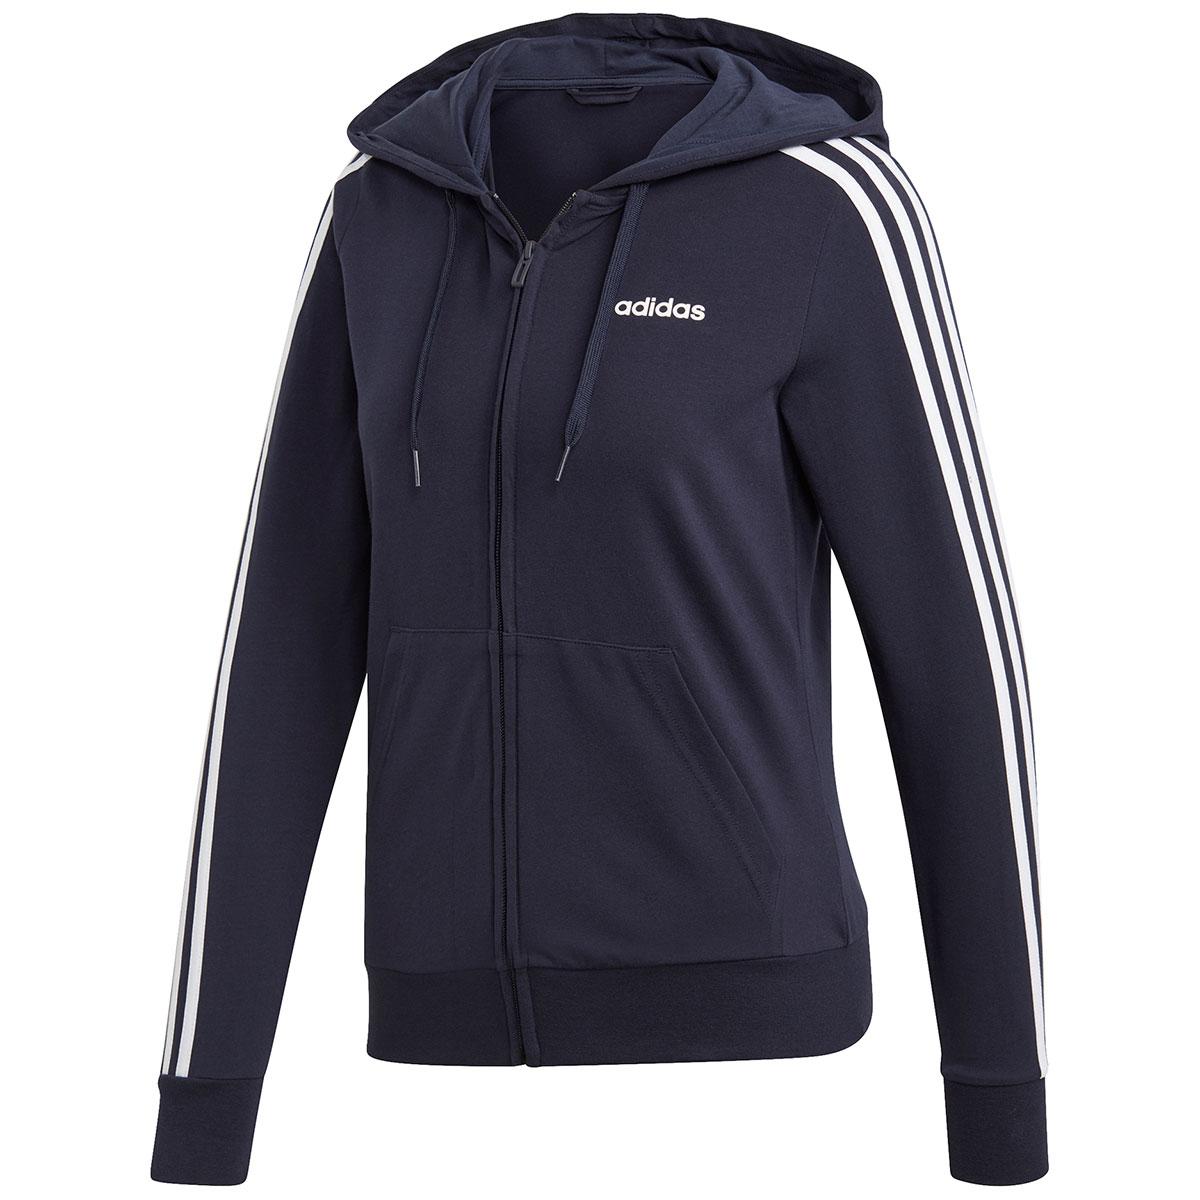 Adidas Women's Essentials 3-Stripes Hoody - Blue, S